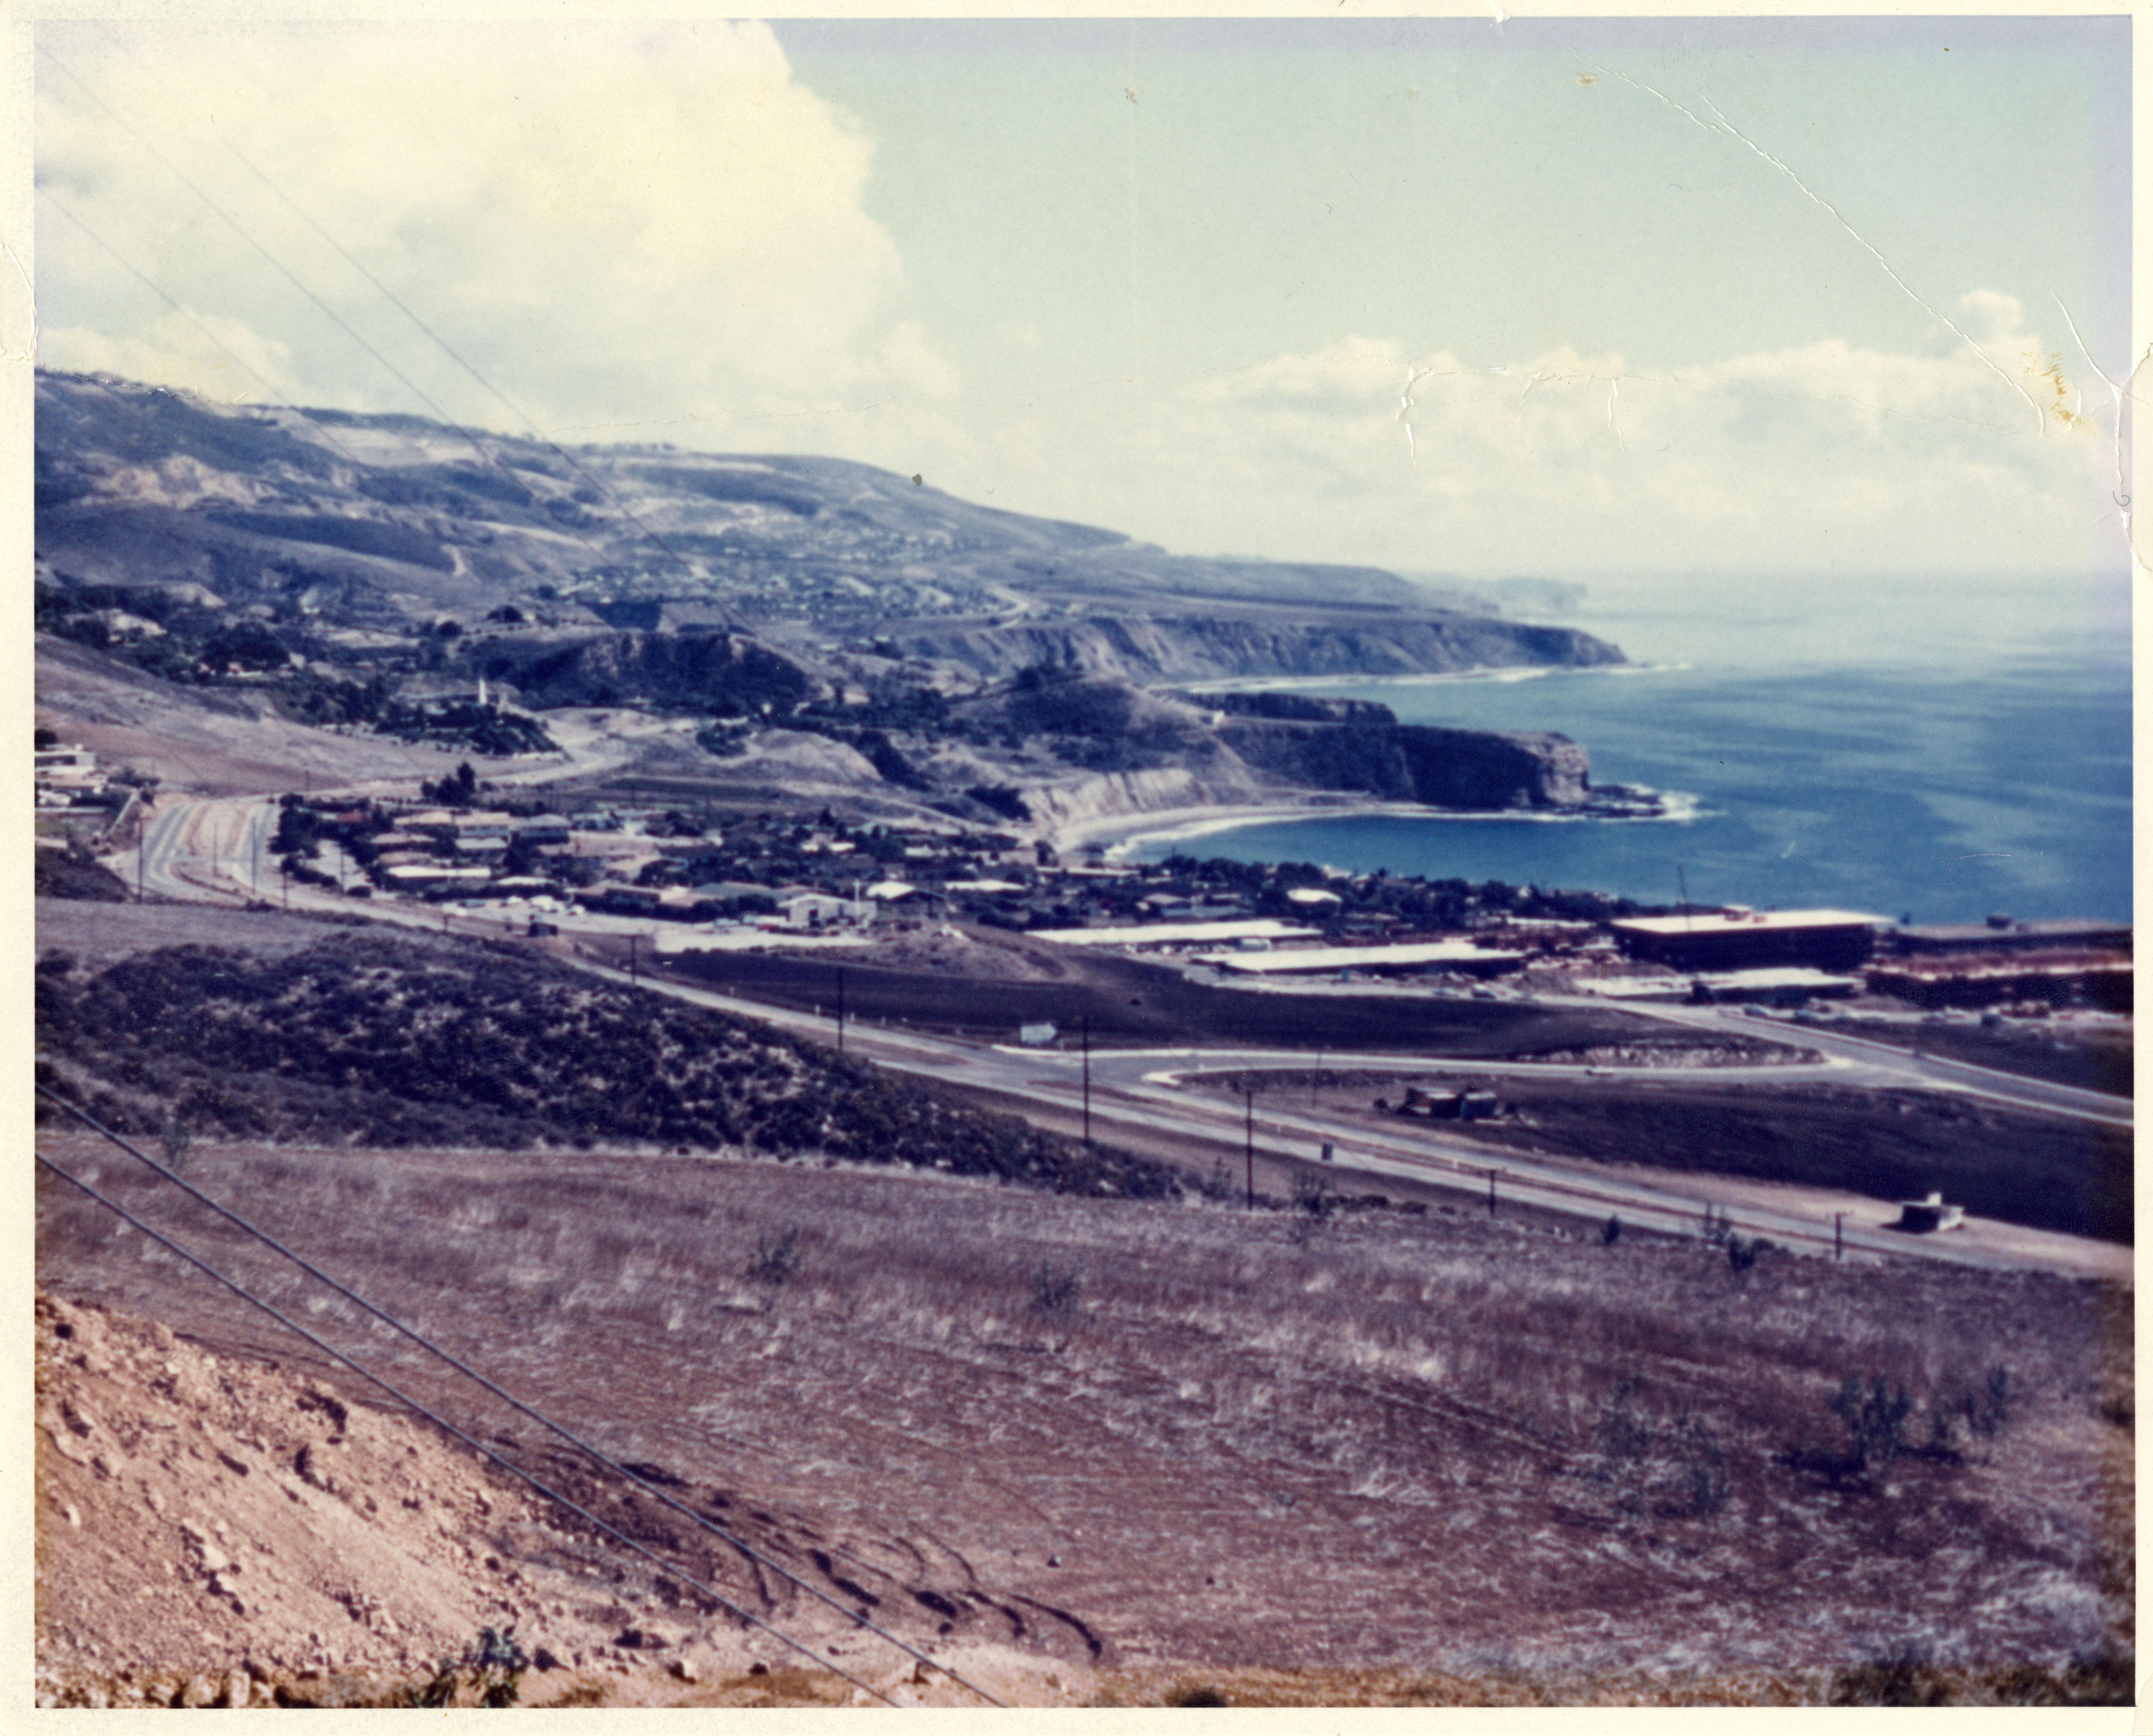 Proposed site of CSC Palos Verdes campus overlooking Pacific Ocean